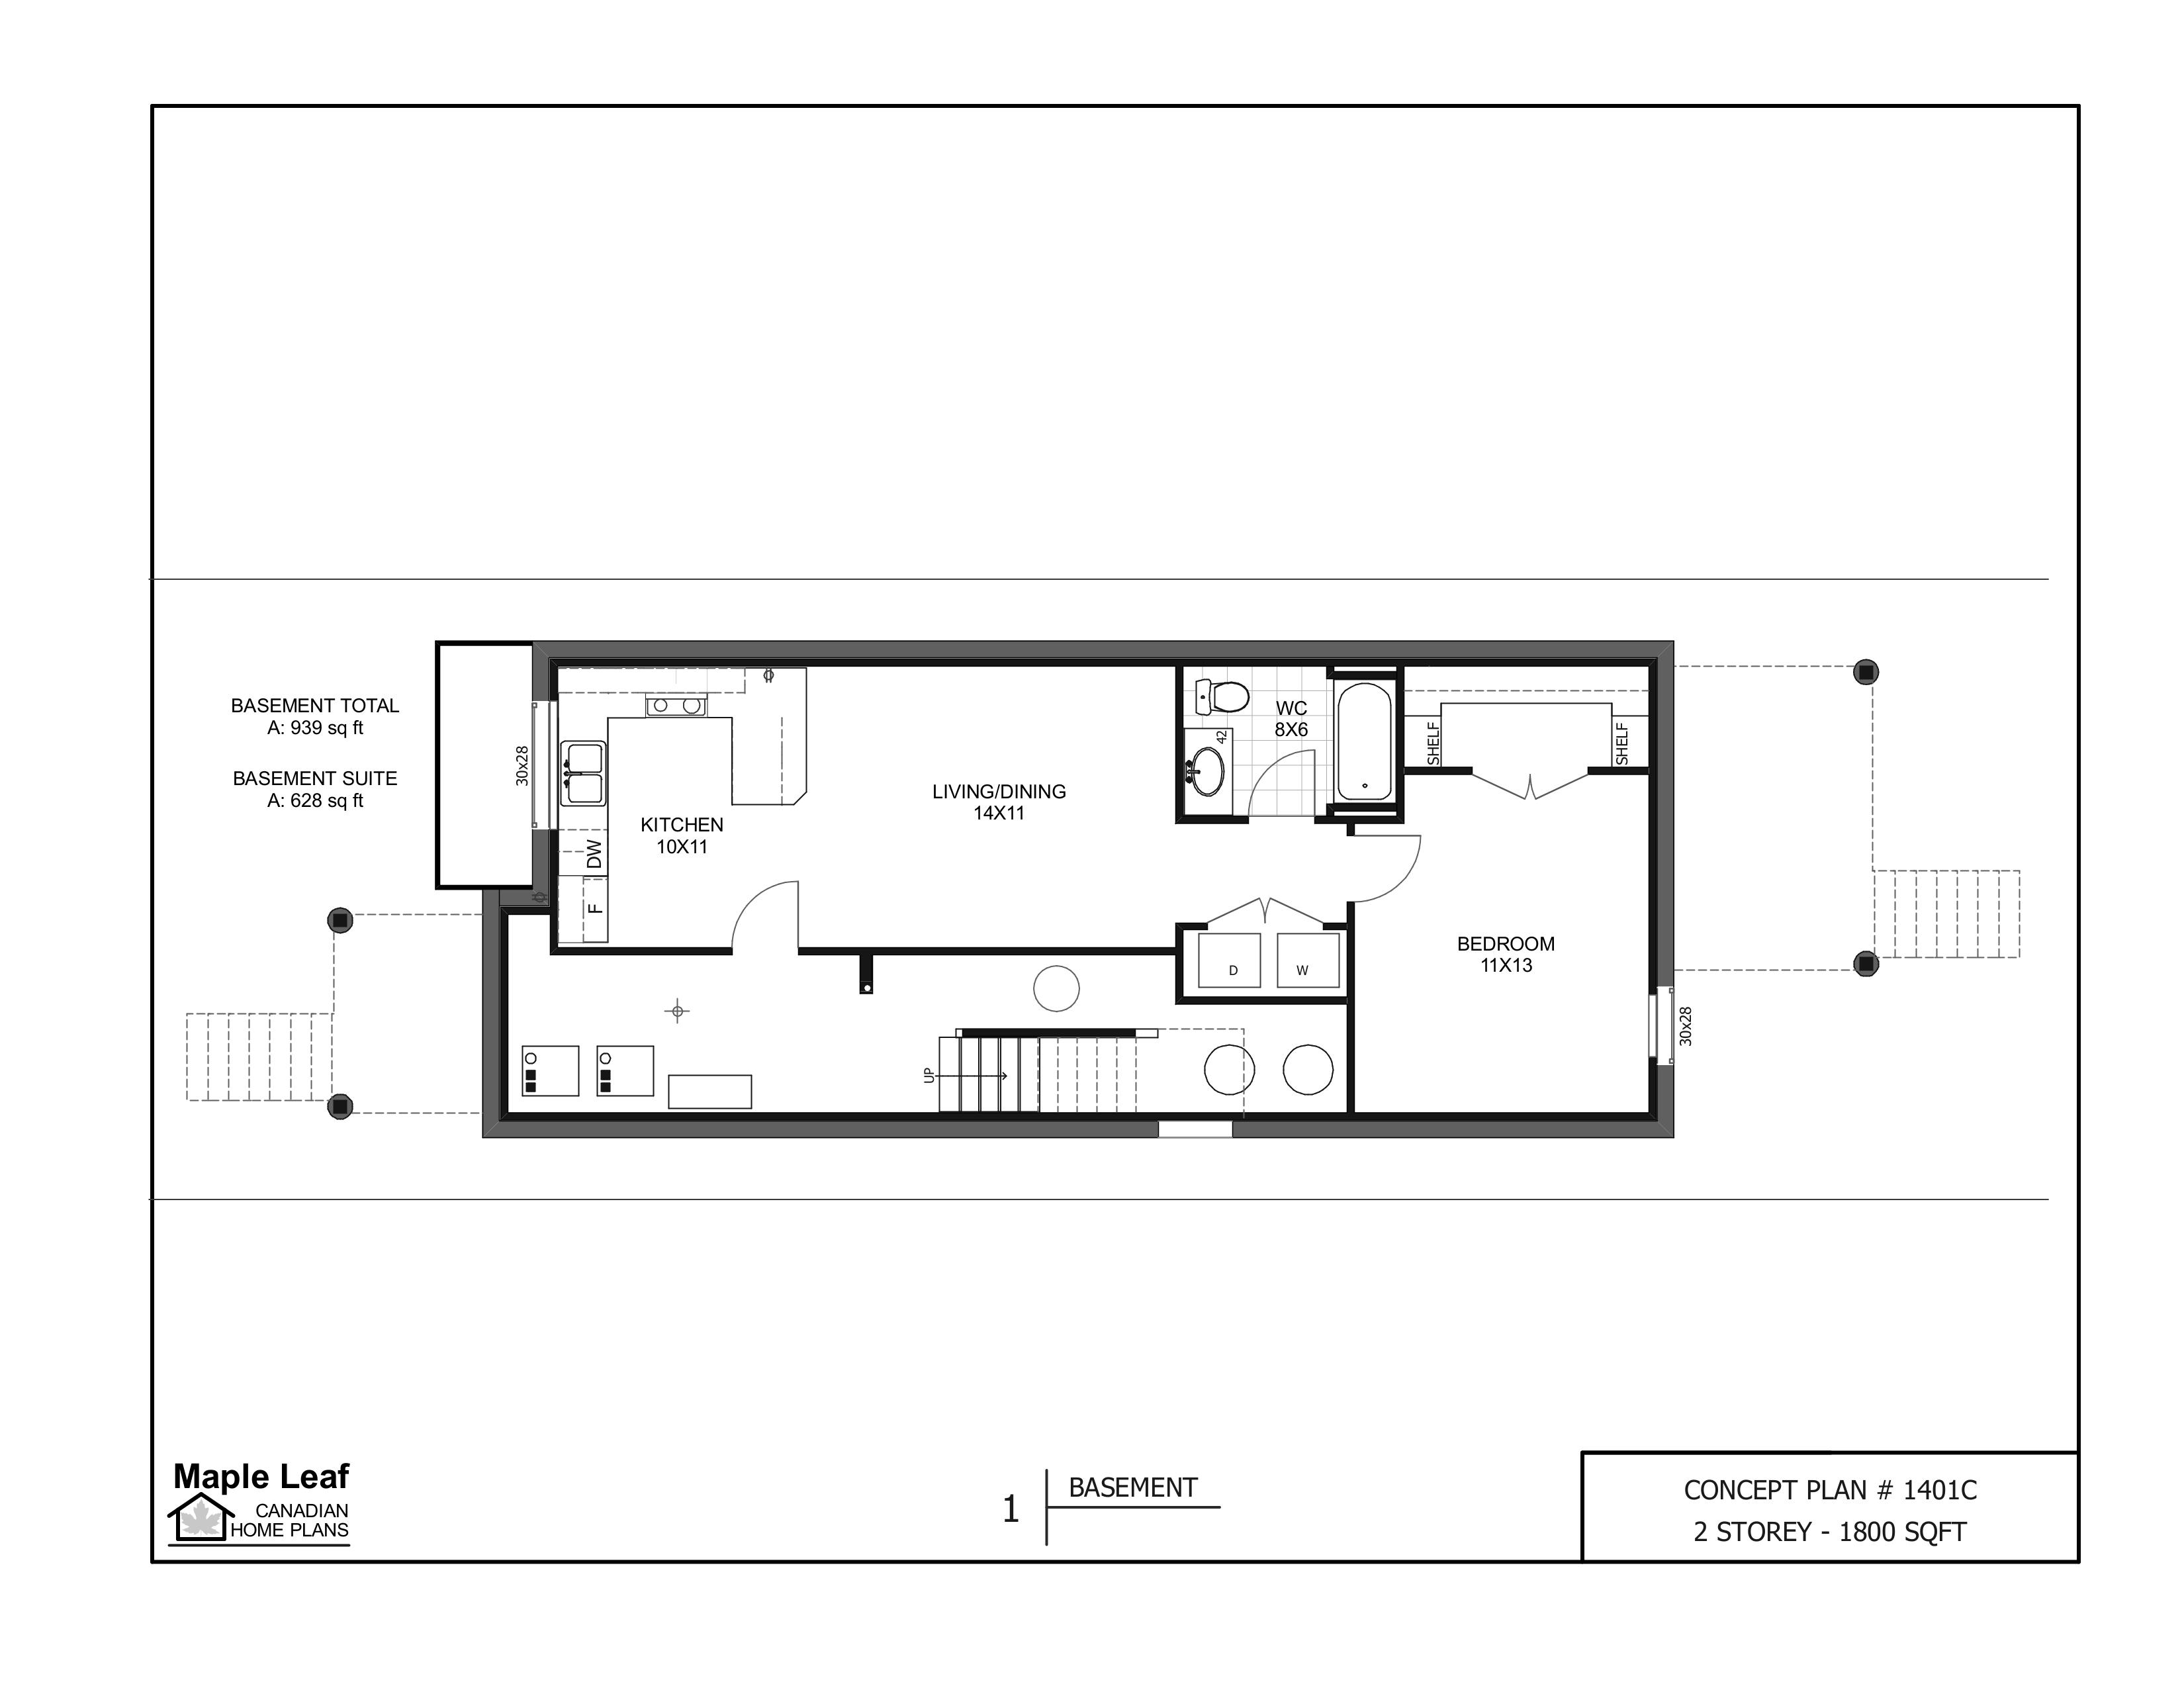 storey 1800 sqft for 25ft lot maple leaf canadian home plans